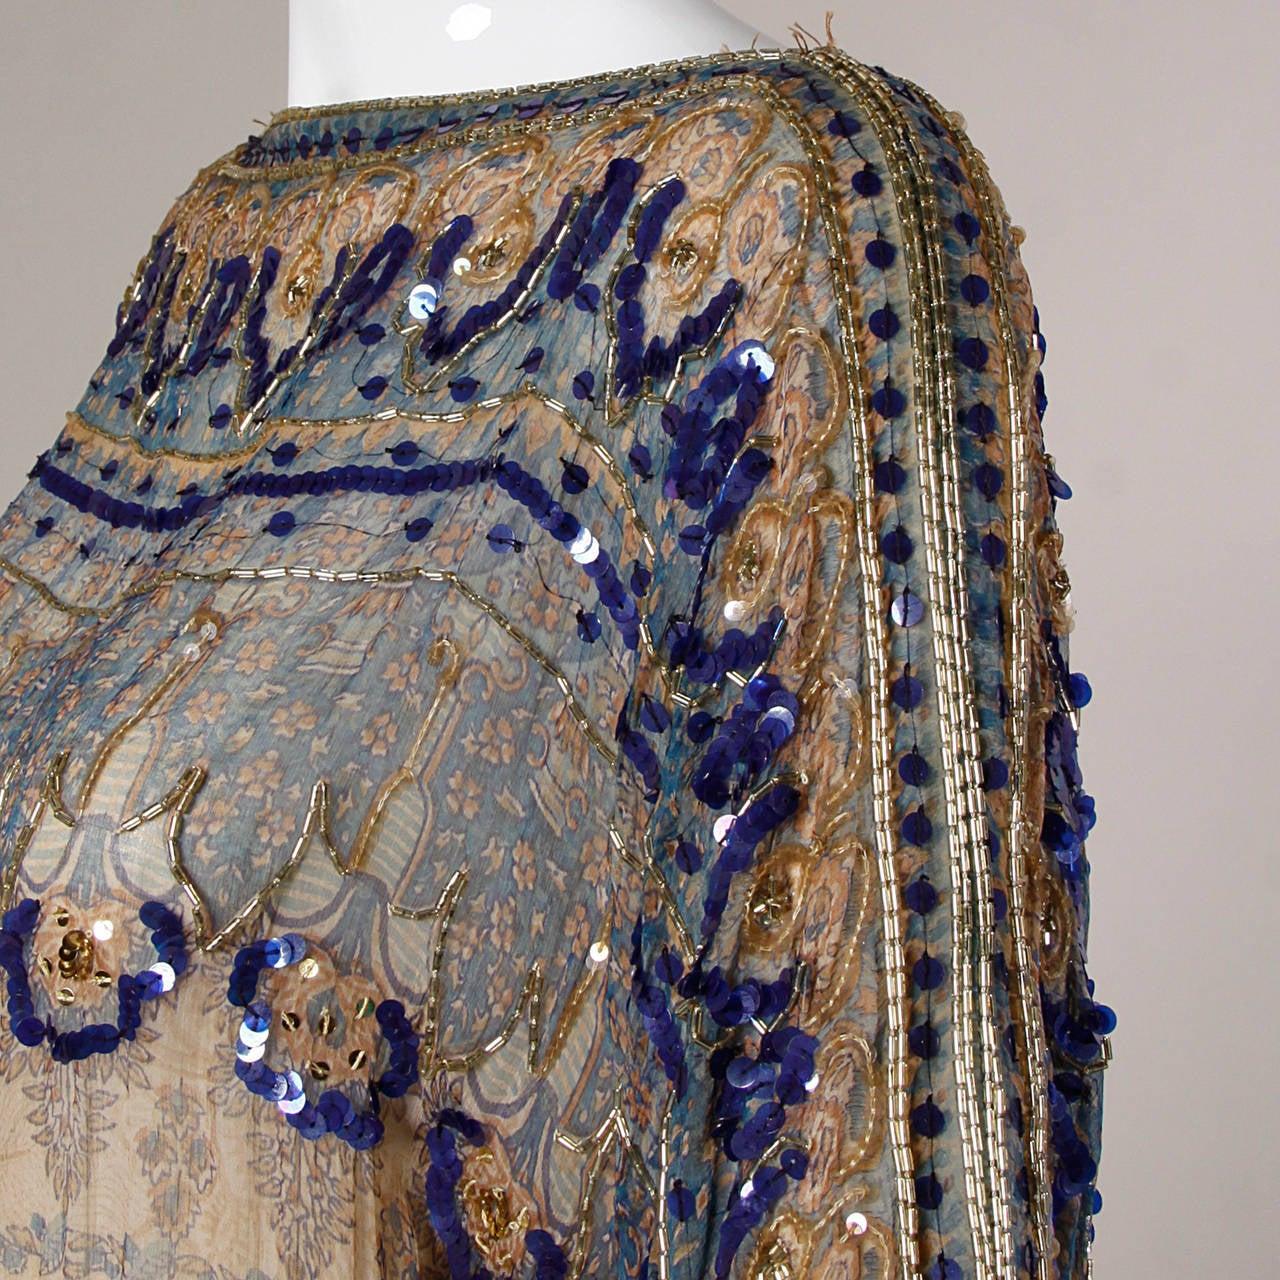 Judith Ann for Bullock's Wilshire Vintage 1970s Silk India Print Dress 4